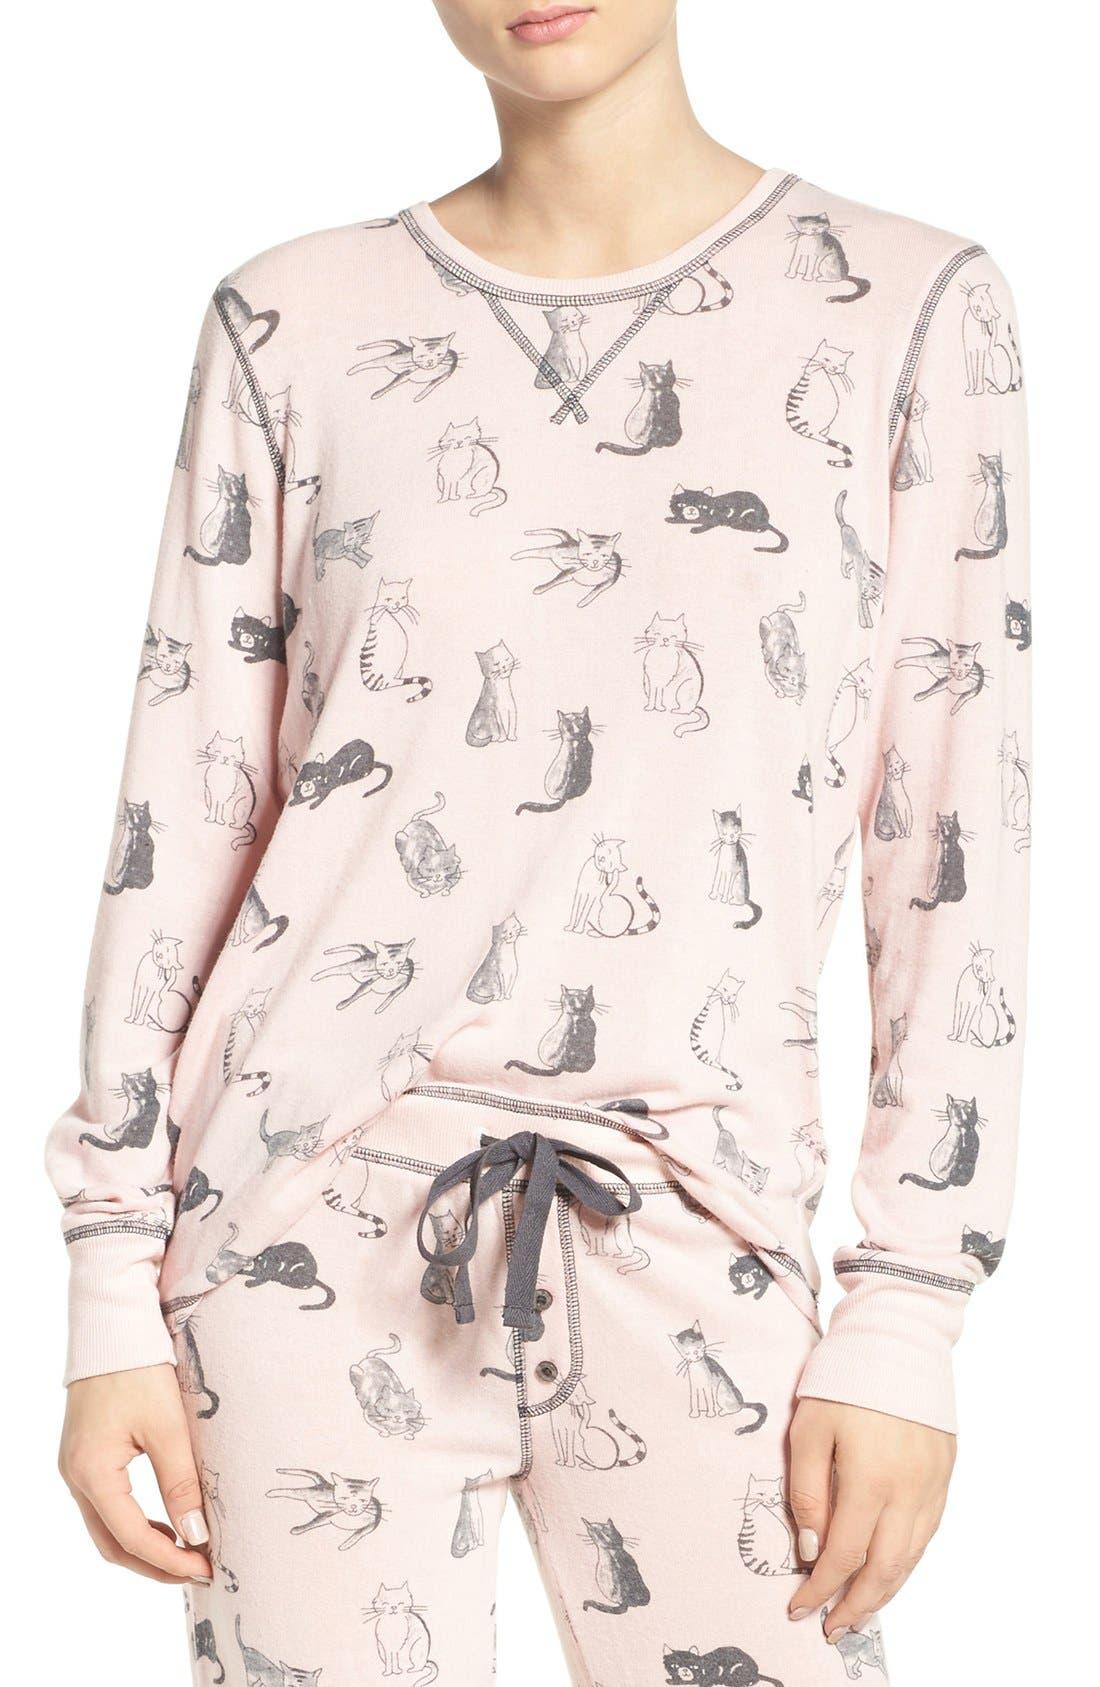 Alternate Image 1 Selected - PJ Salvage Peachy Jersey Top